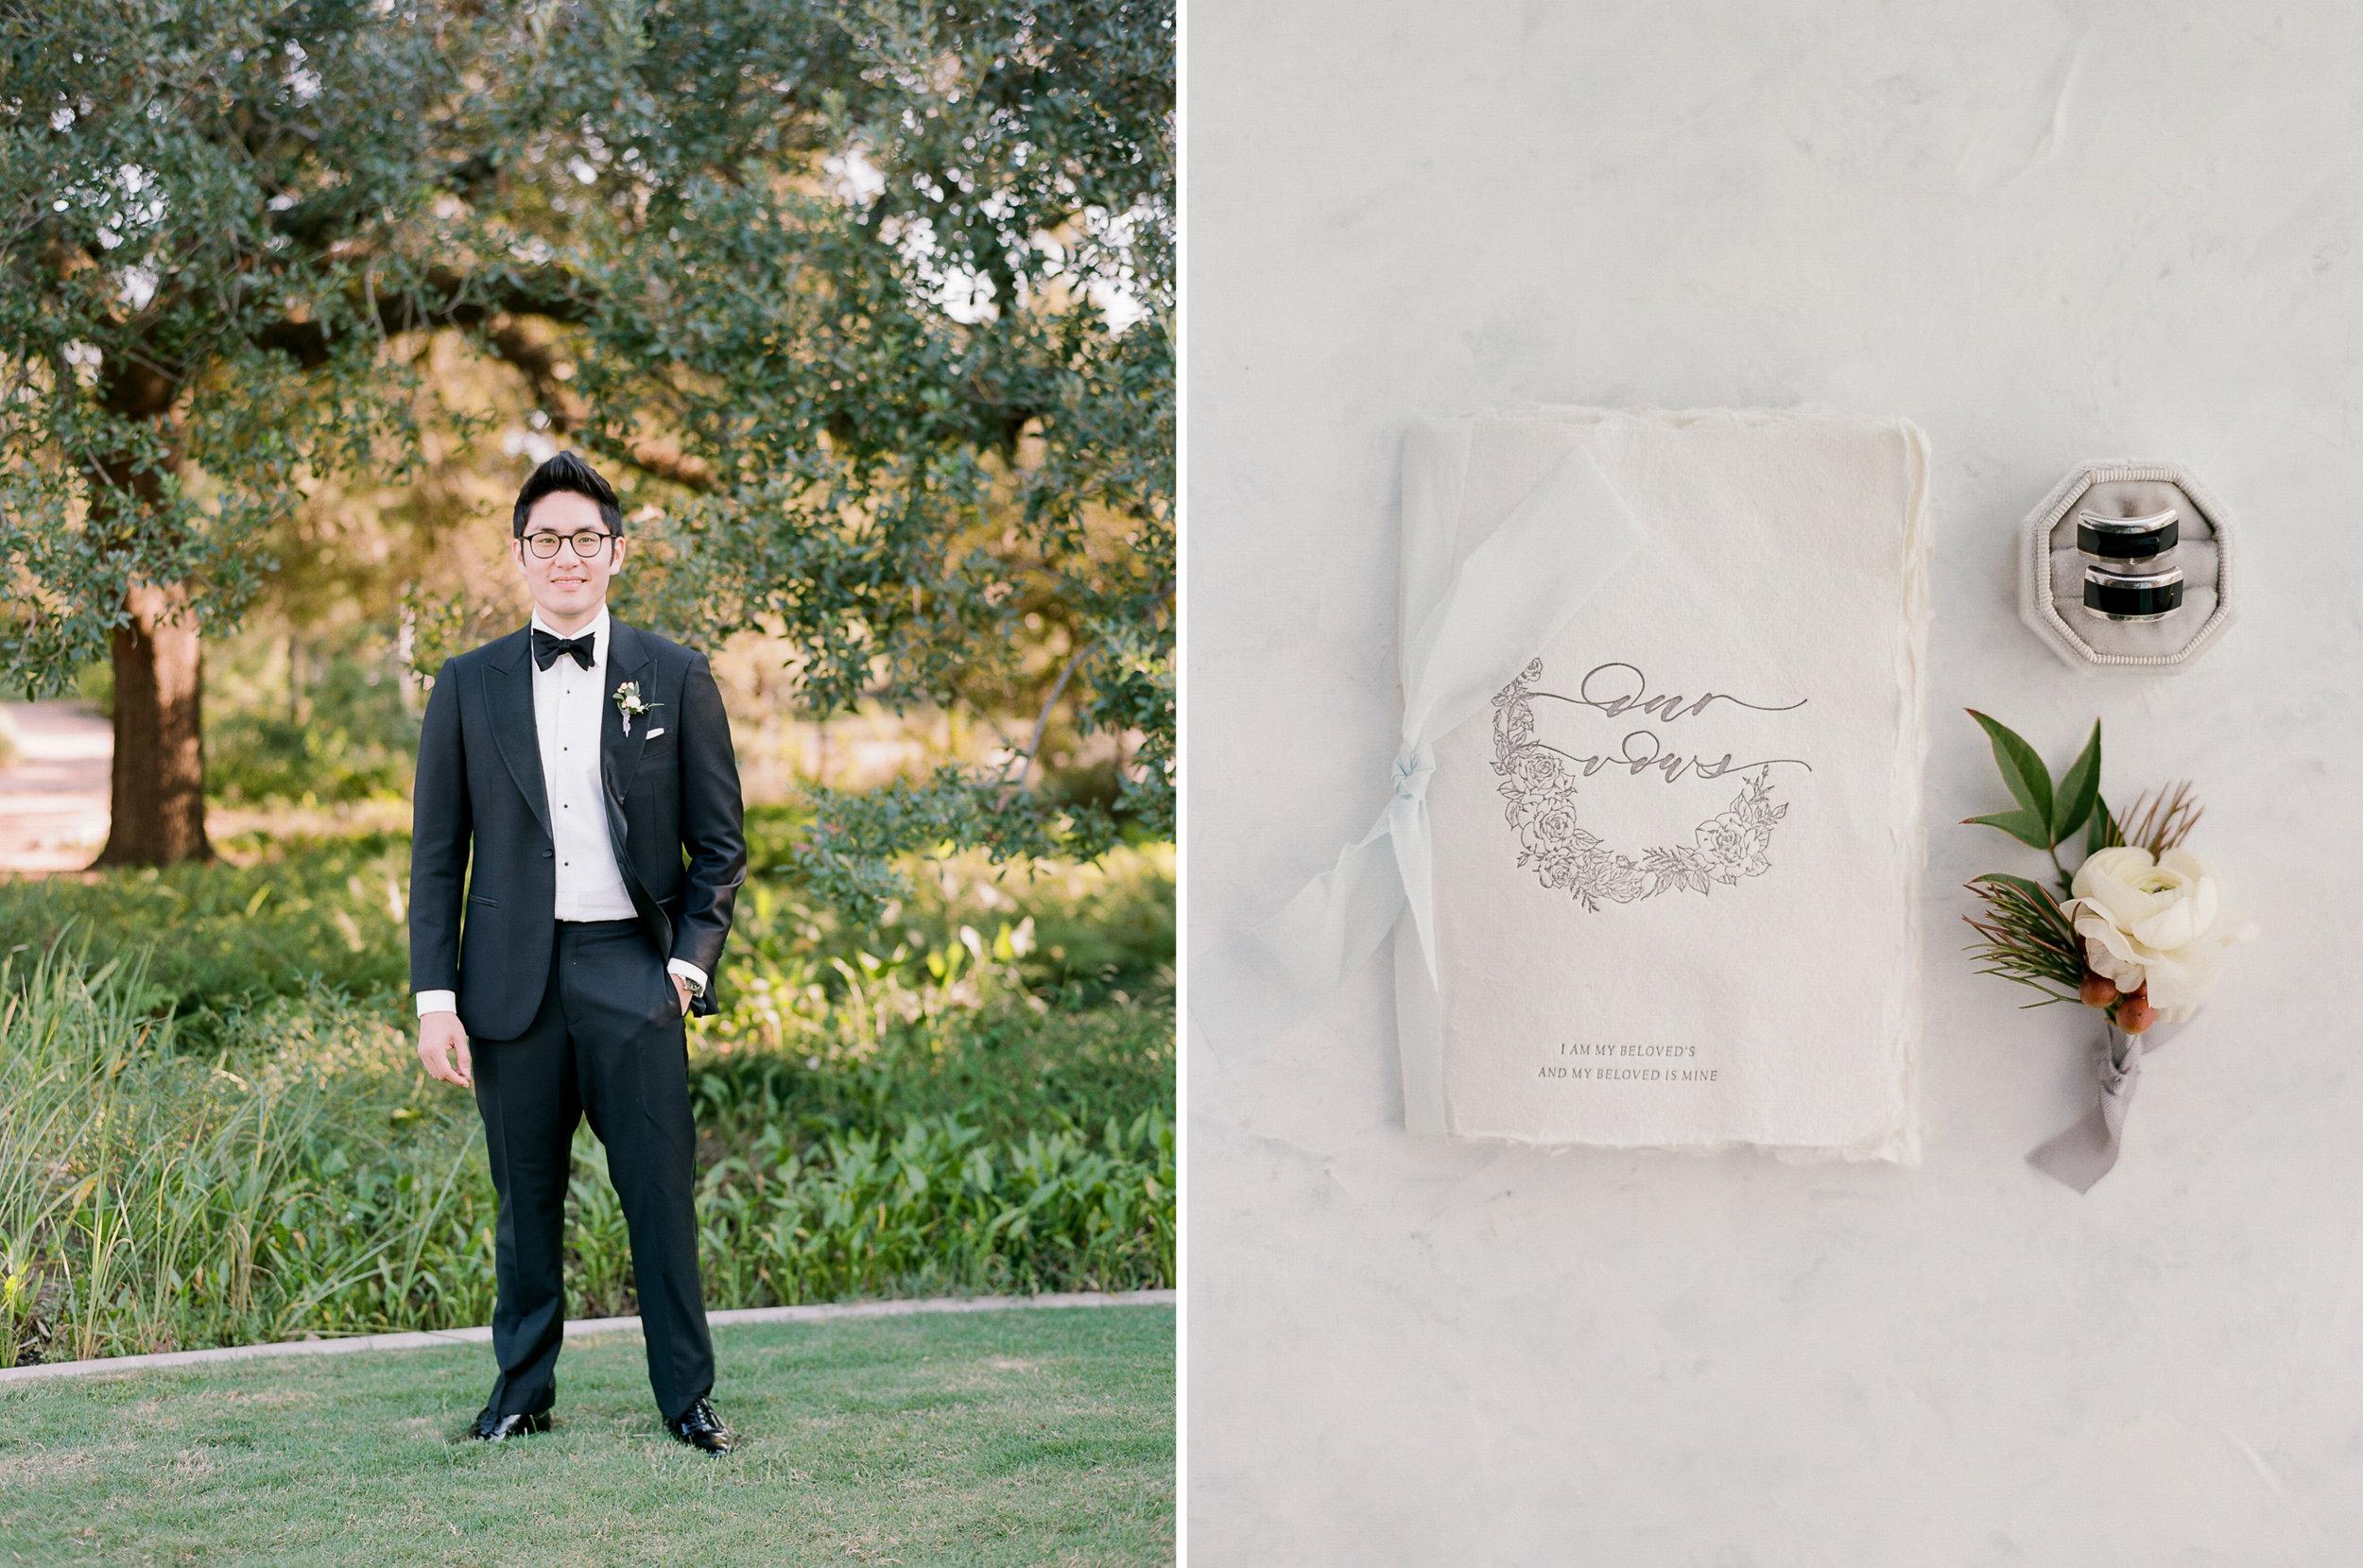 Martha-Stewart-Wedding-Dana-Fernandez-Photography-Josh-Texas-Film-Houston-Wedding-Fine-Art-Photographer-McGovern-Centennial-Gardens-Top-Best-111.jpg